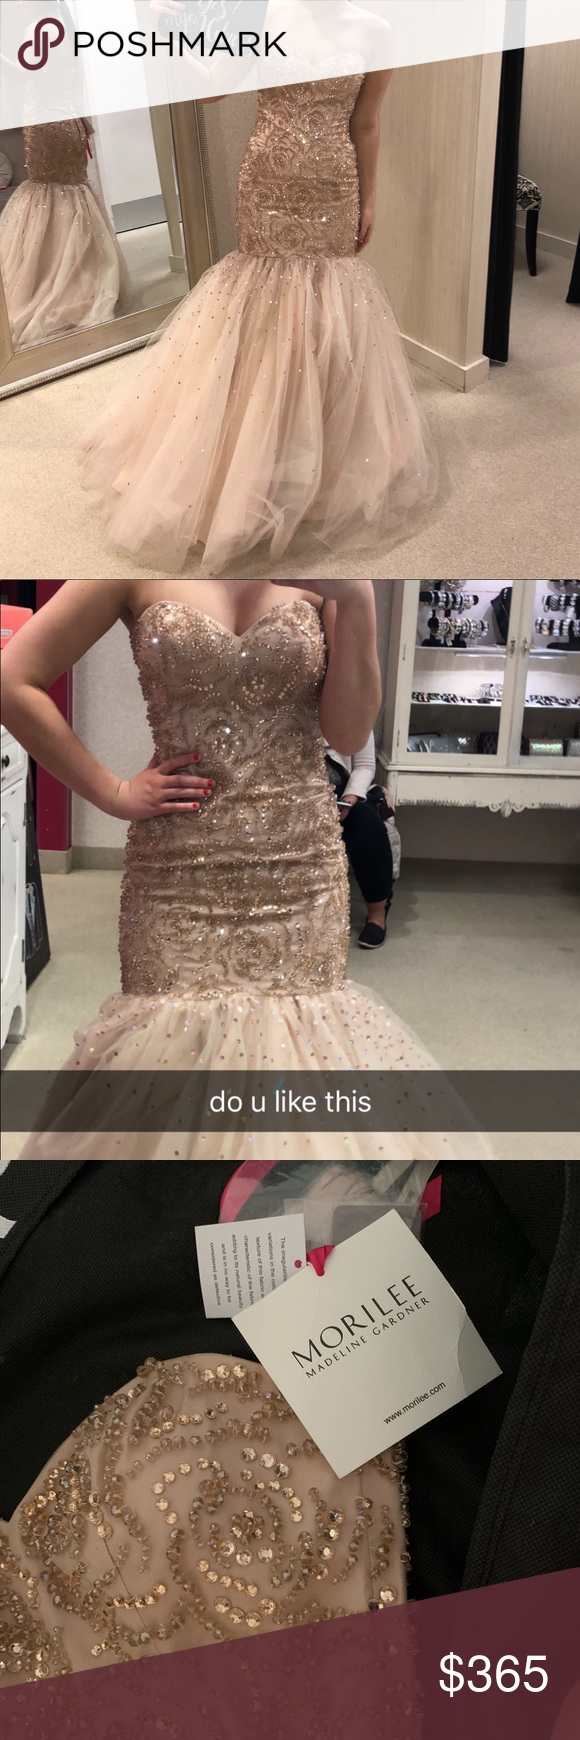 Mori Lee Prom Dress W Jewelry Mori Lee Prom Dresses Dresses Prom Dresses [ 1740 x 580 Pixel ]